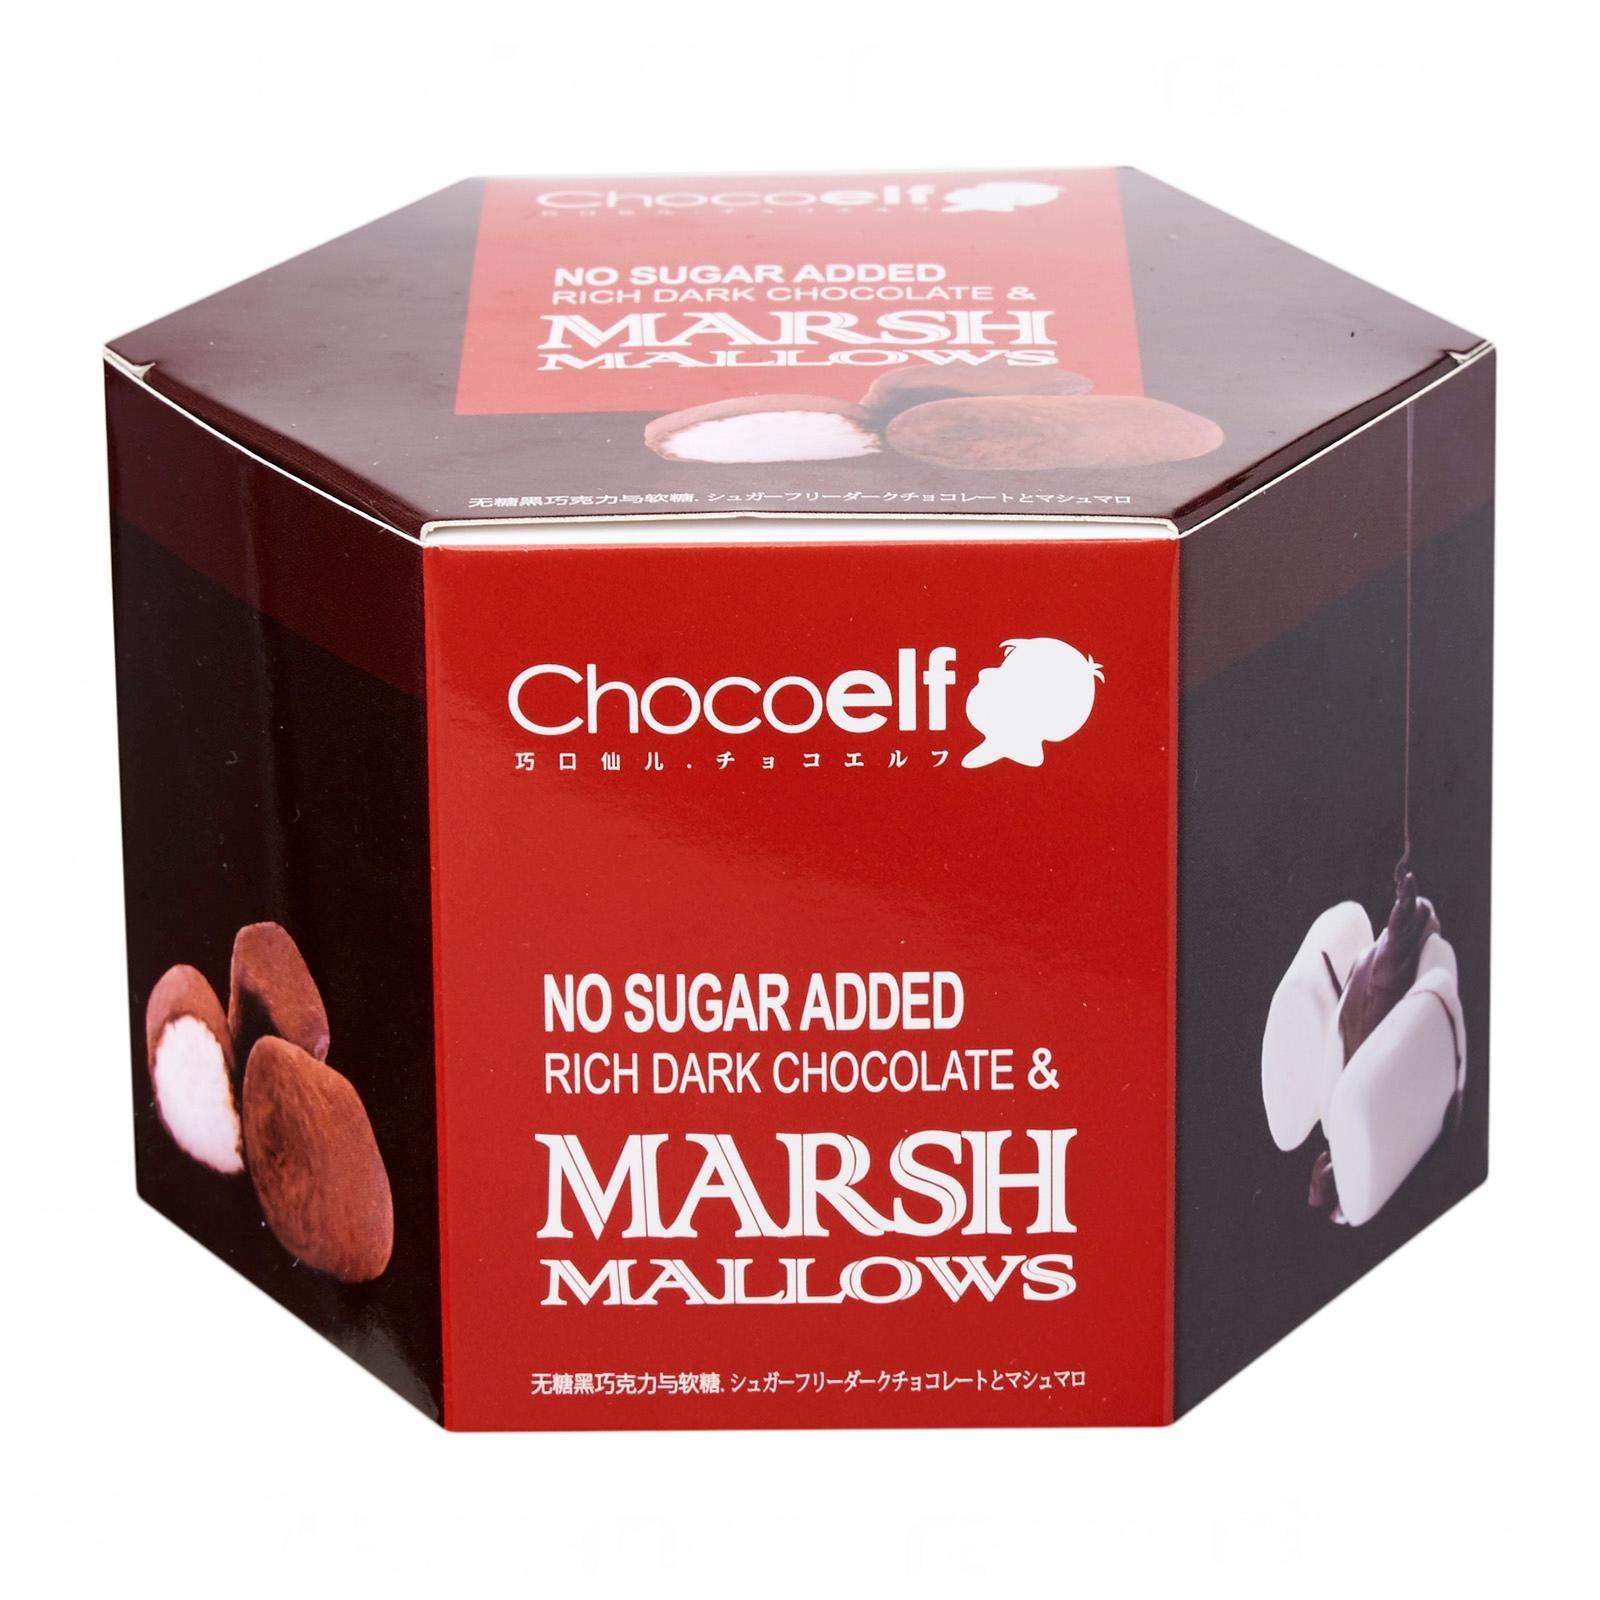 CHOCOELF Marshmallow Chocolate - Dark (No Sugar Added)